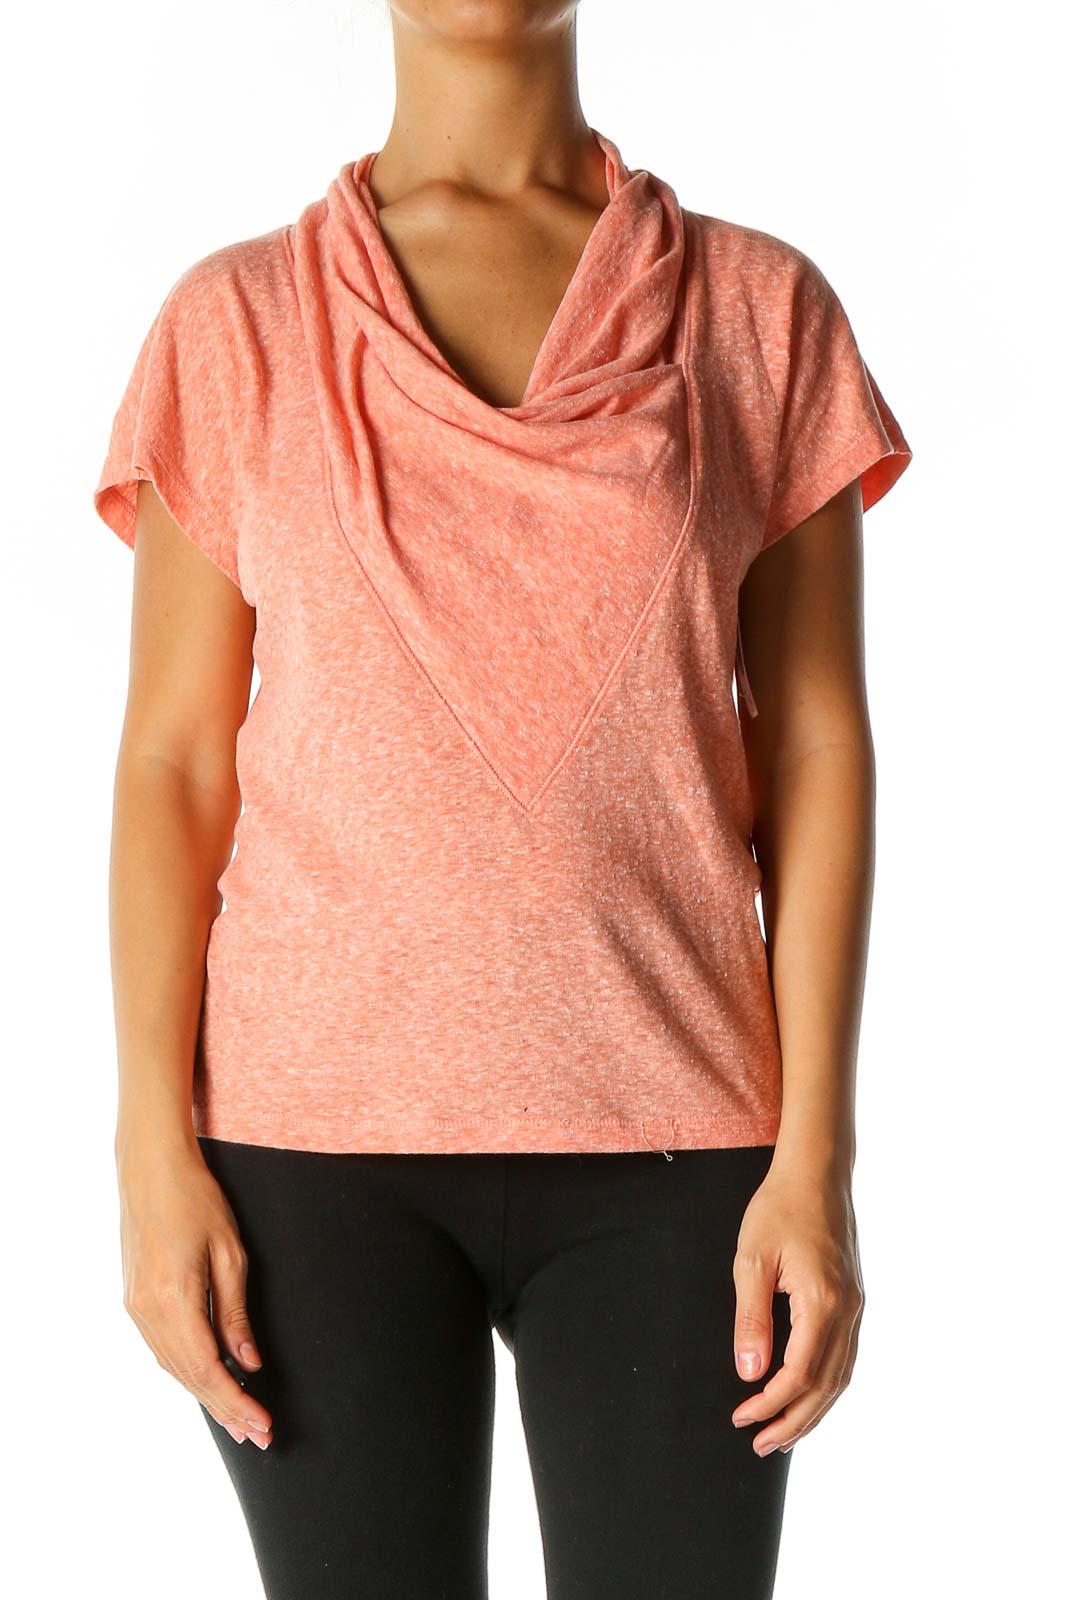 Orange Solid Activewear T-Shirt Front